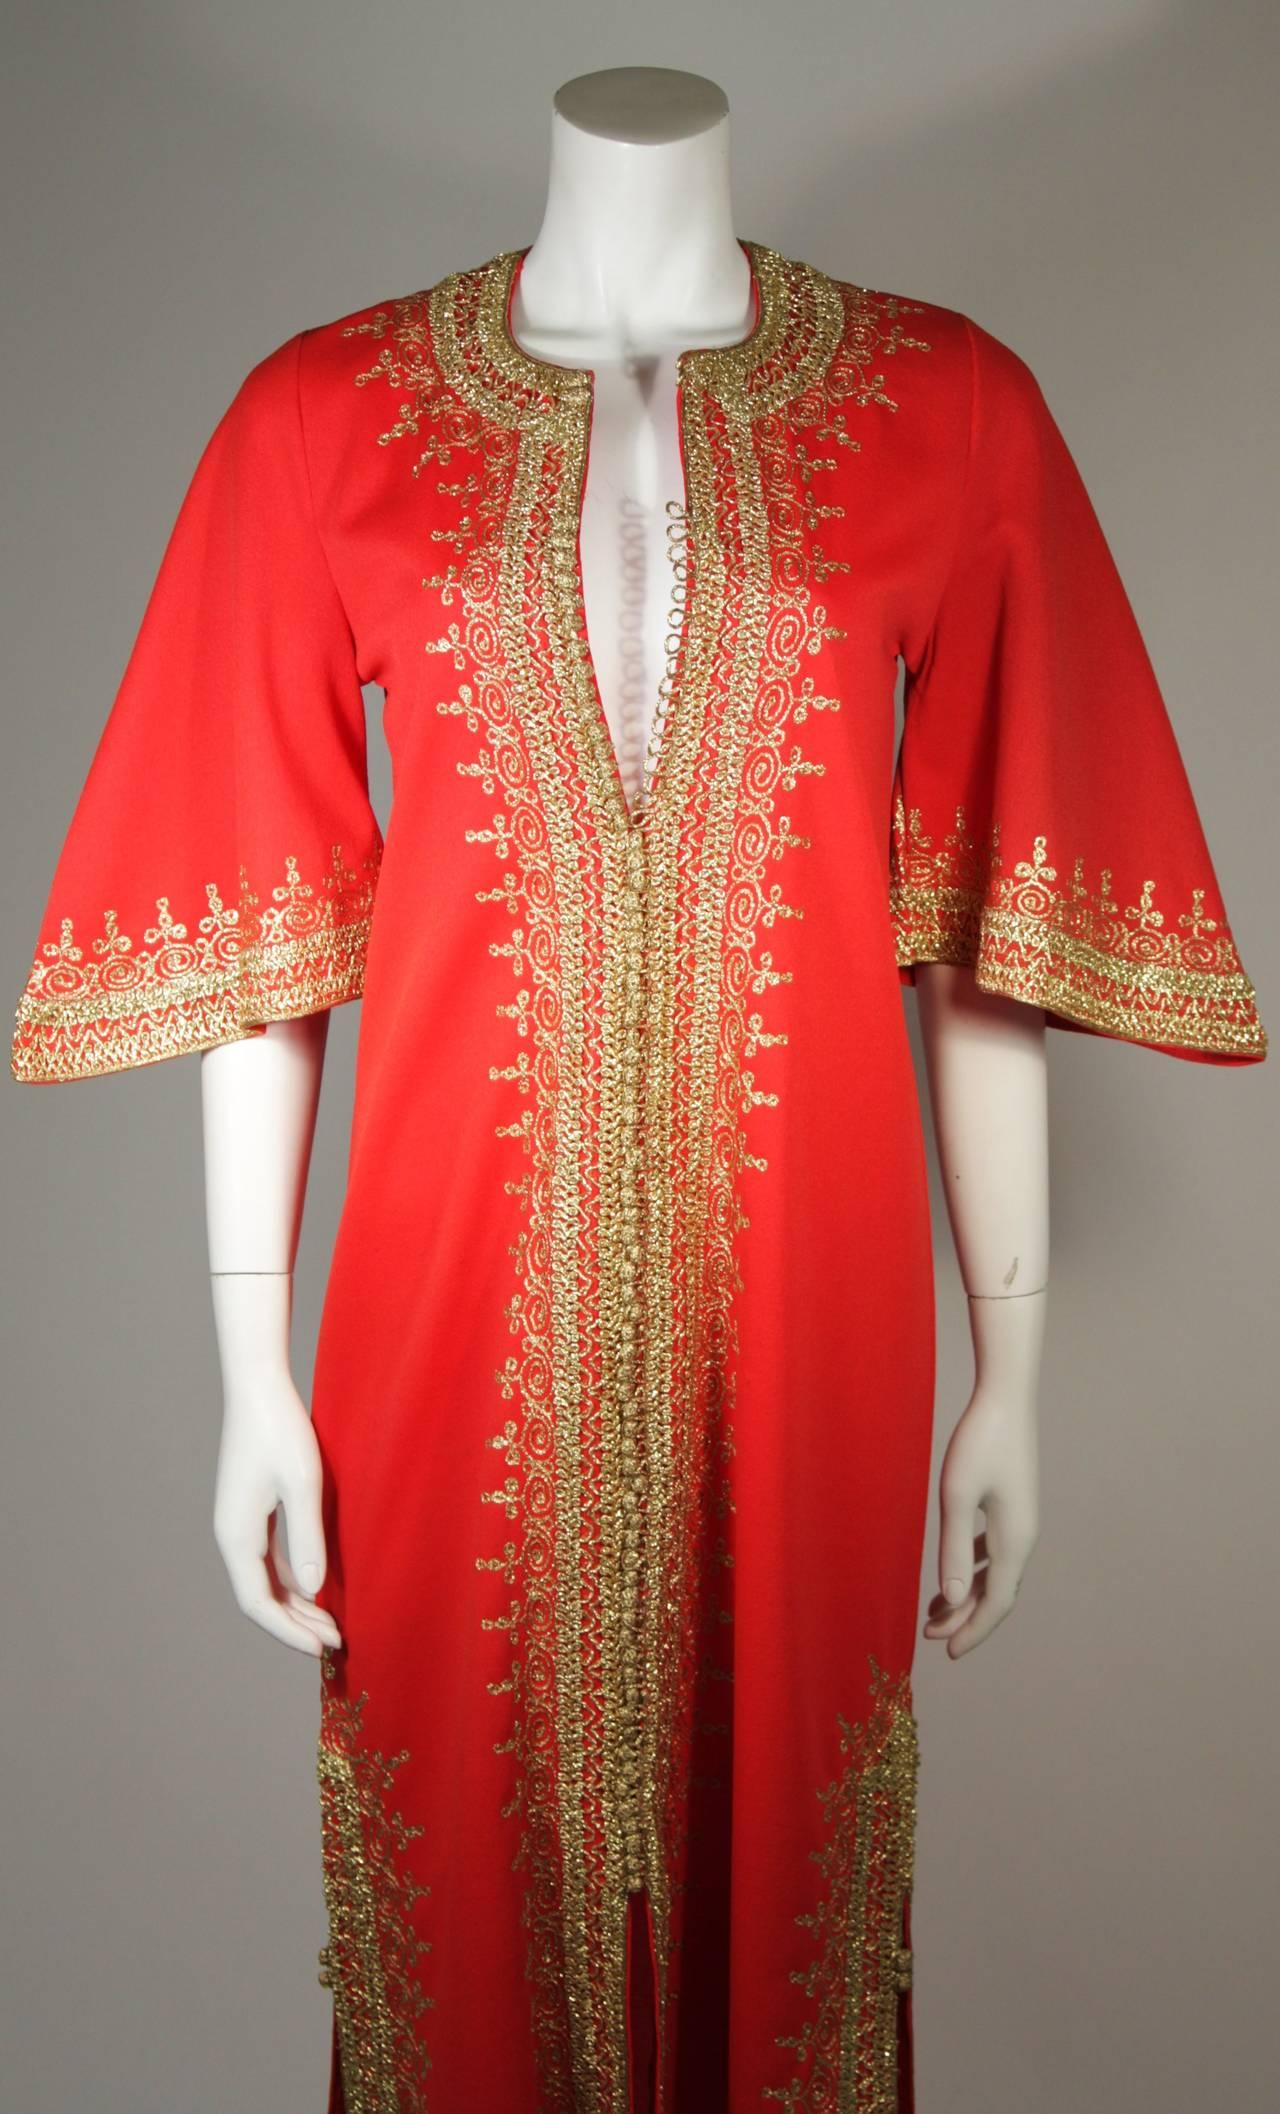 Custom Orange and Gold Indian Kaftan Size Small 3